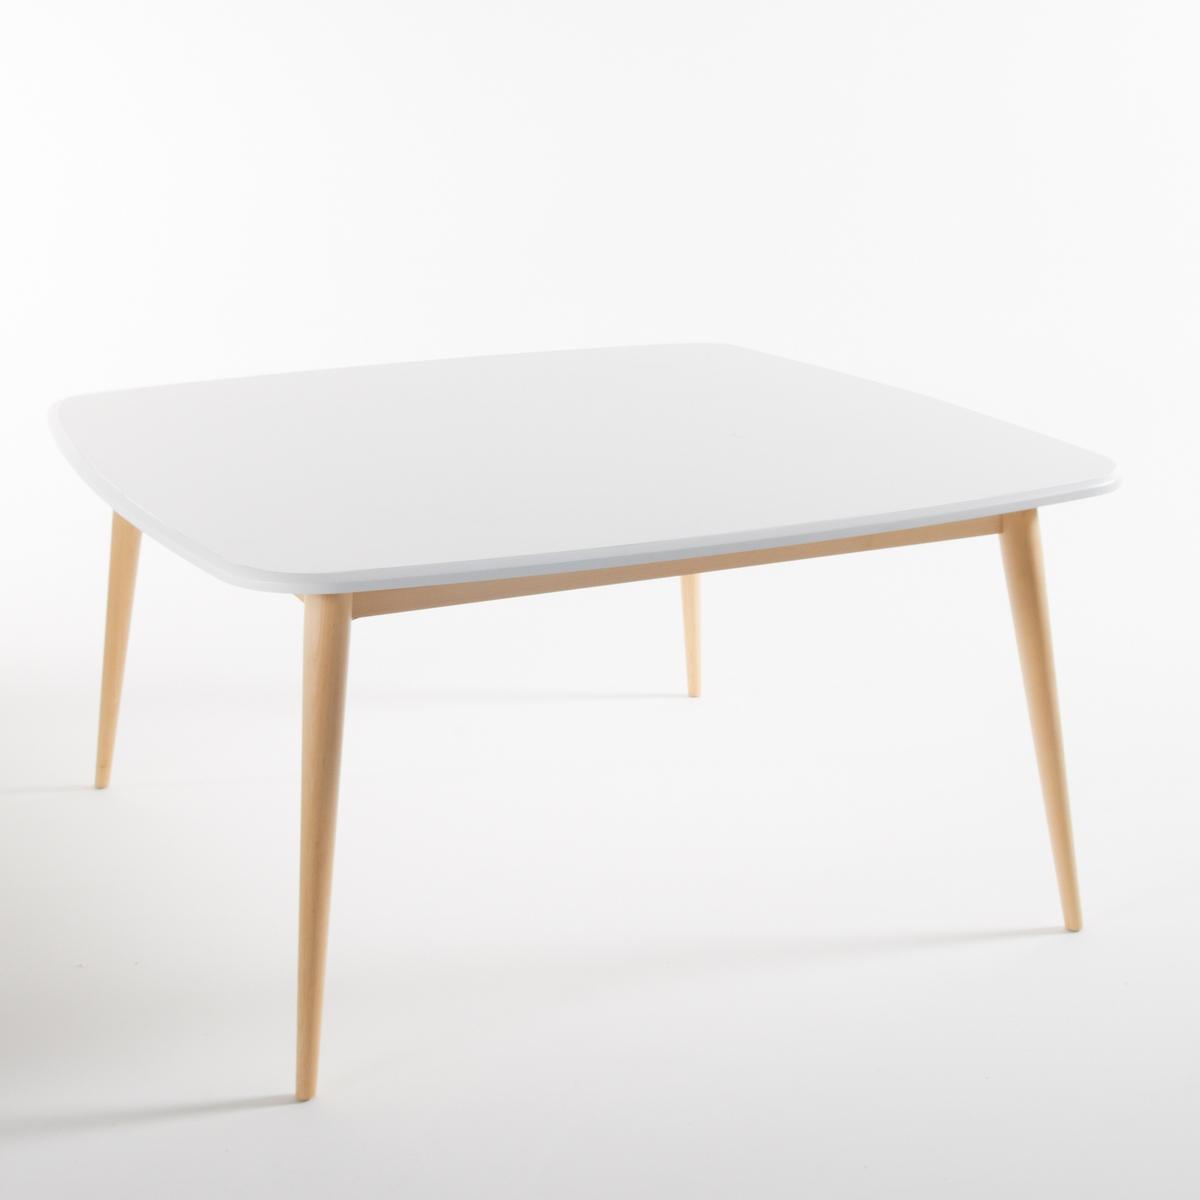 Стол La Redoute Квадратный на персон JIMI 8 персоны белый стол la redoute обеденный с удлинением персон jimi 10 персоны белый